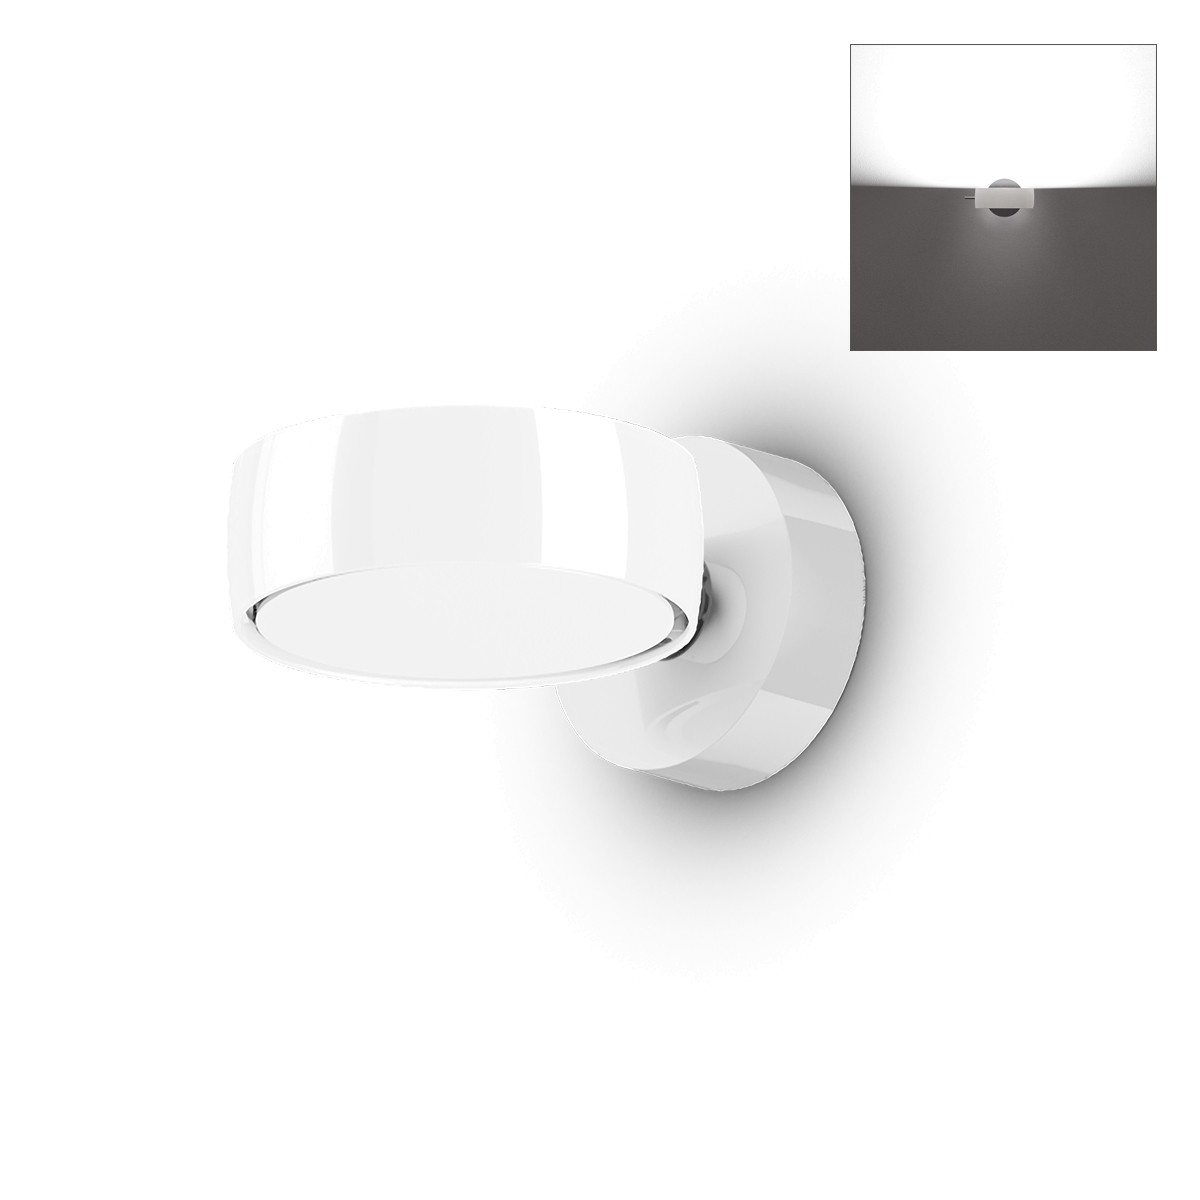 Occhio Sento B LED verticale up Wandleuchte, 18 W / 2700 K, Chrom / weiß glänzend